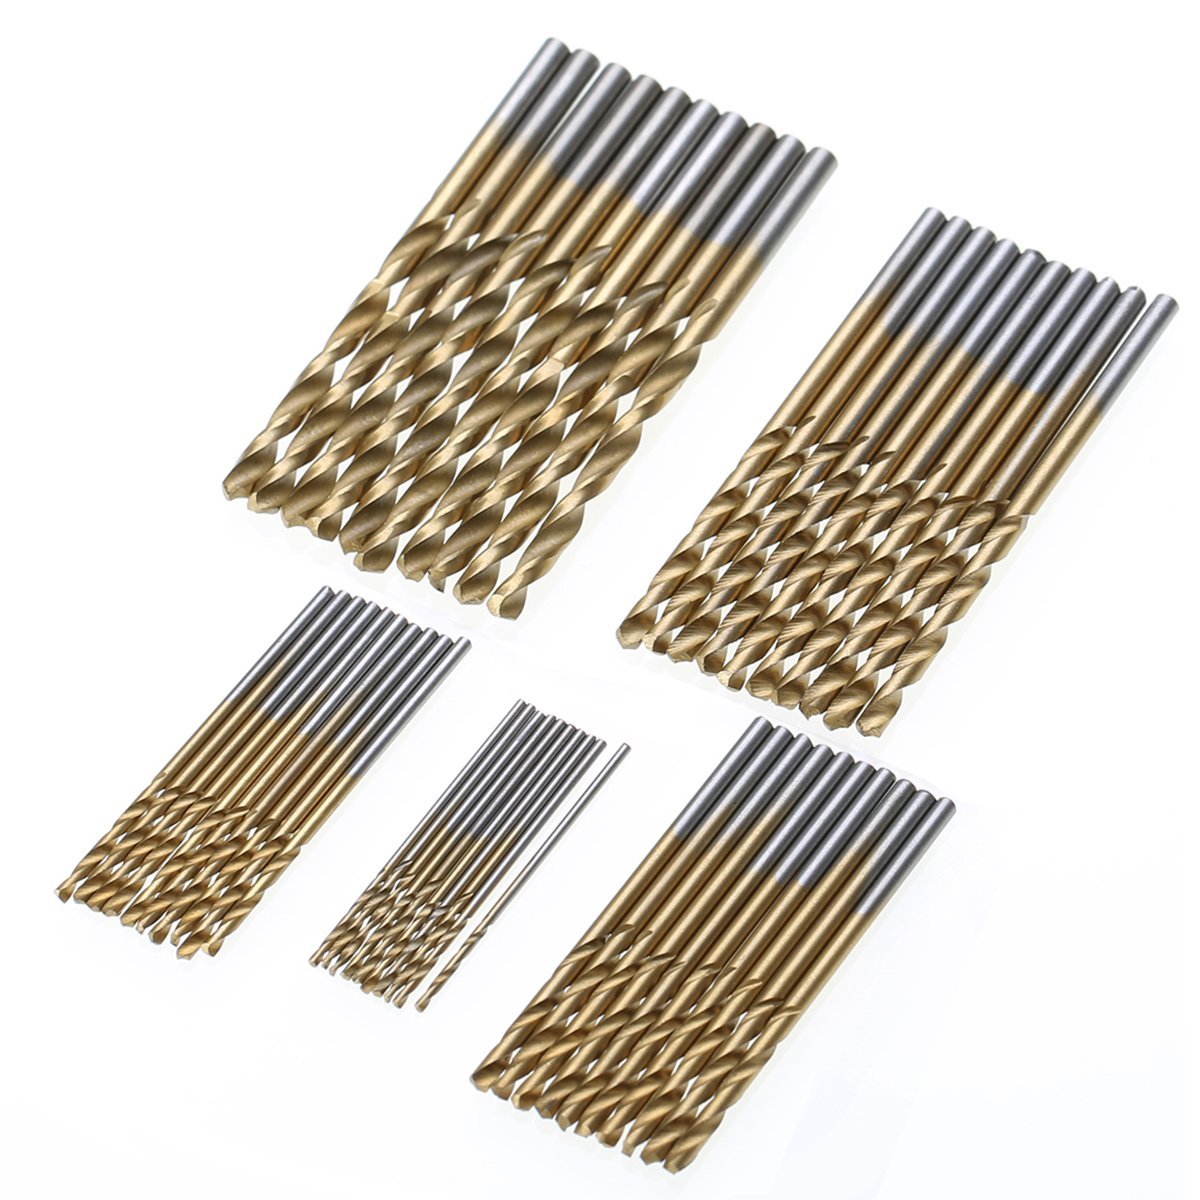 50 Stü cke Spiralbohrer HSS High Speed Stahl Metallbohrer Micro Bohrer Set 1/1.5/2 / 2.5 / 3mm LANSEYQO